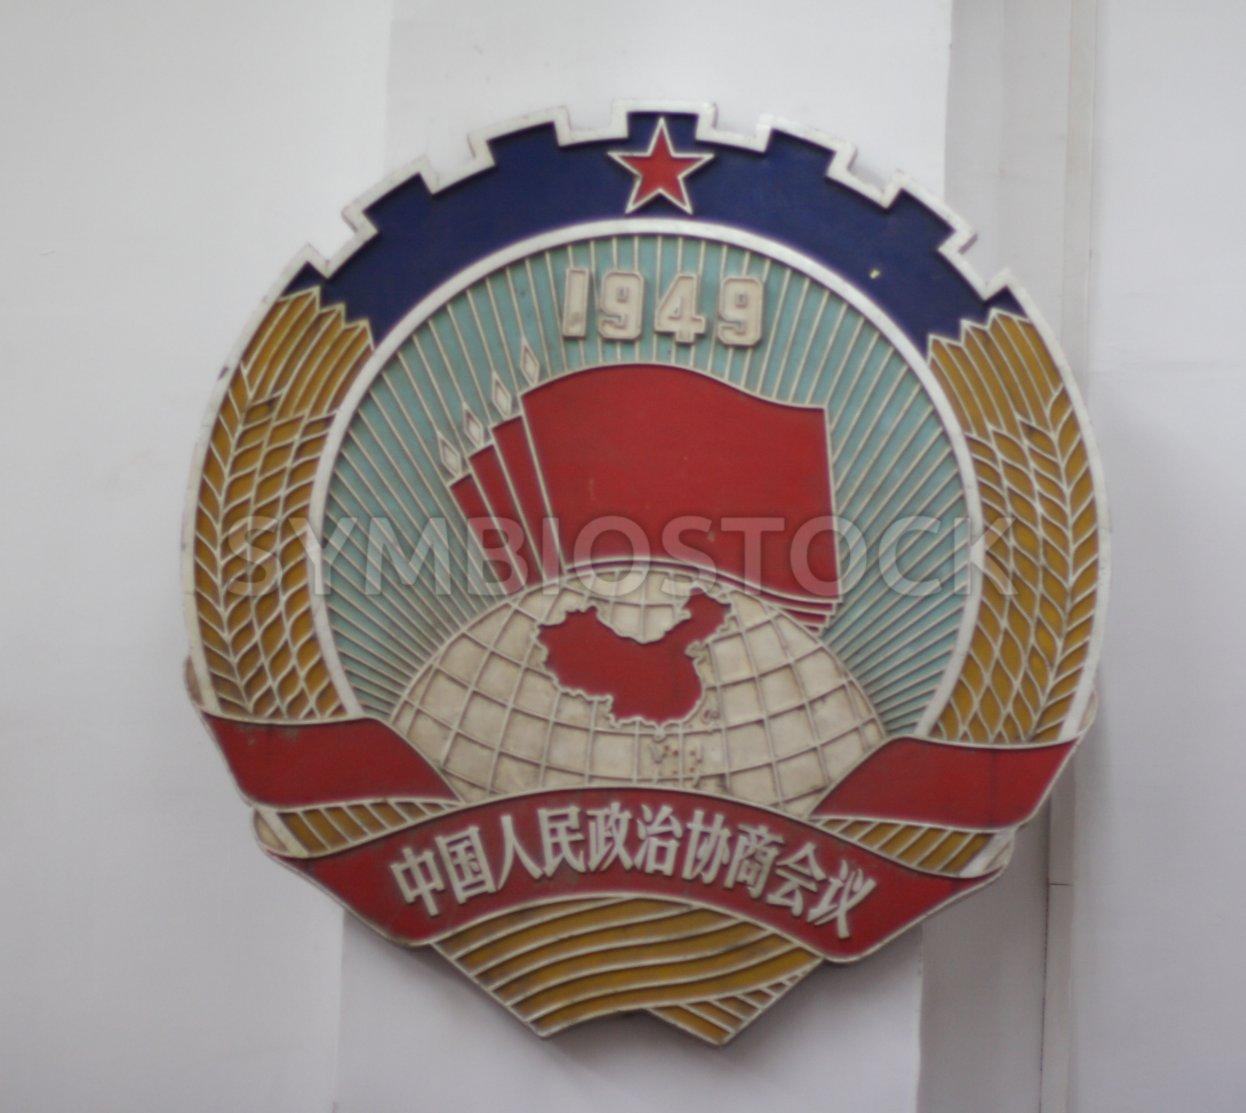 798-art-district-beijing-china_14500372108_o.jpg - davidmcb